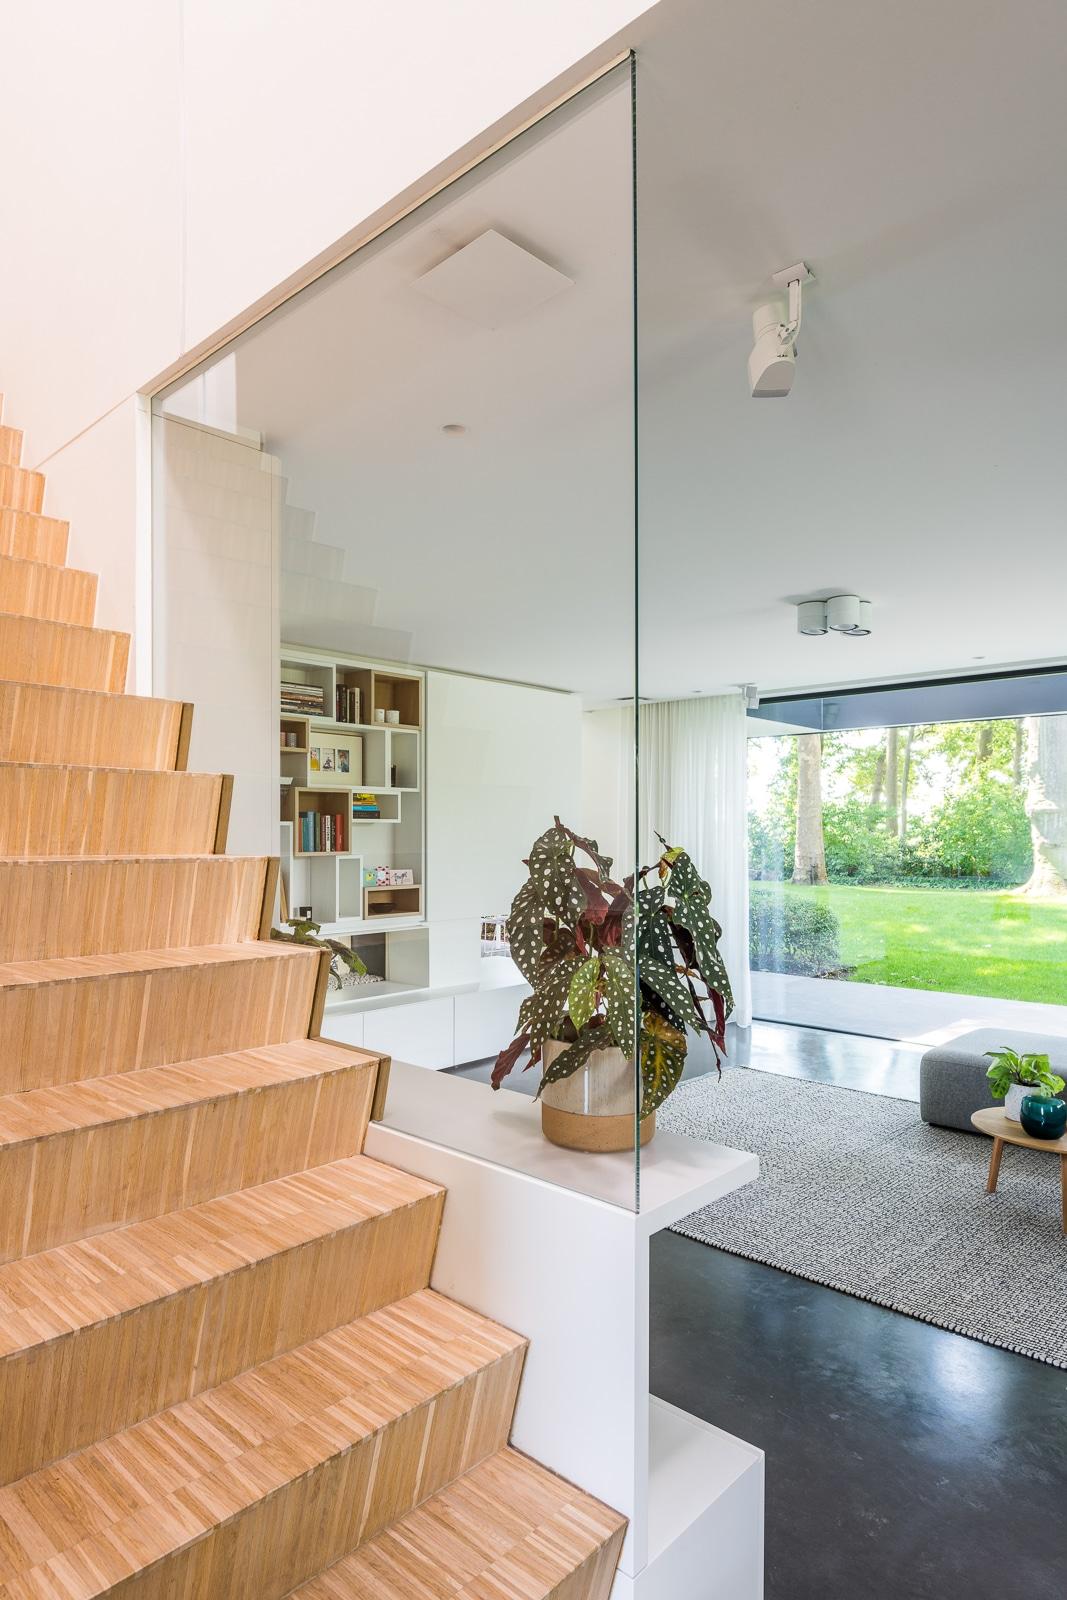 BaeyensBeck Kjell 049web | Baeyens & Beck architecten Gent | architect nieuwbouw renovatie interieur | high end | architectenbureau